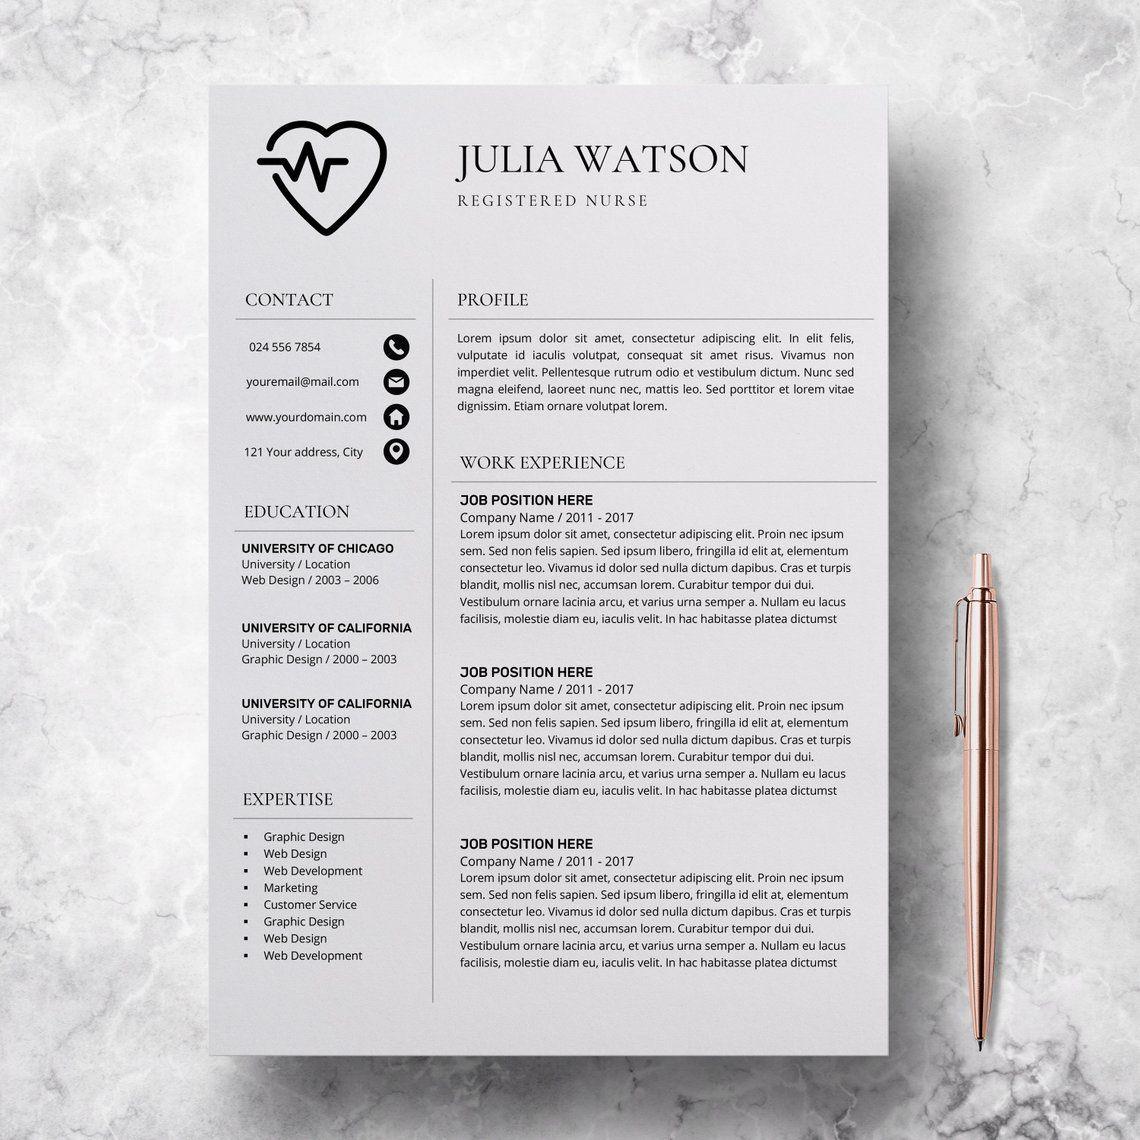 Resume Template Nurse Functional Resume Julia Watson